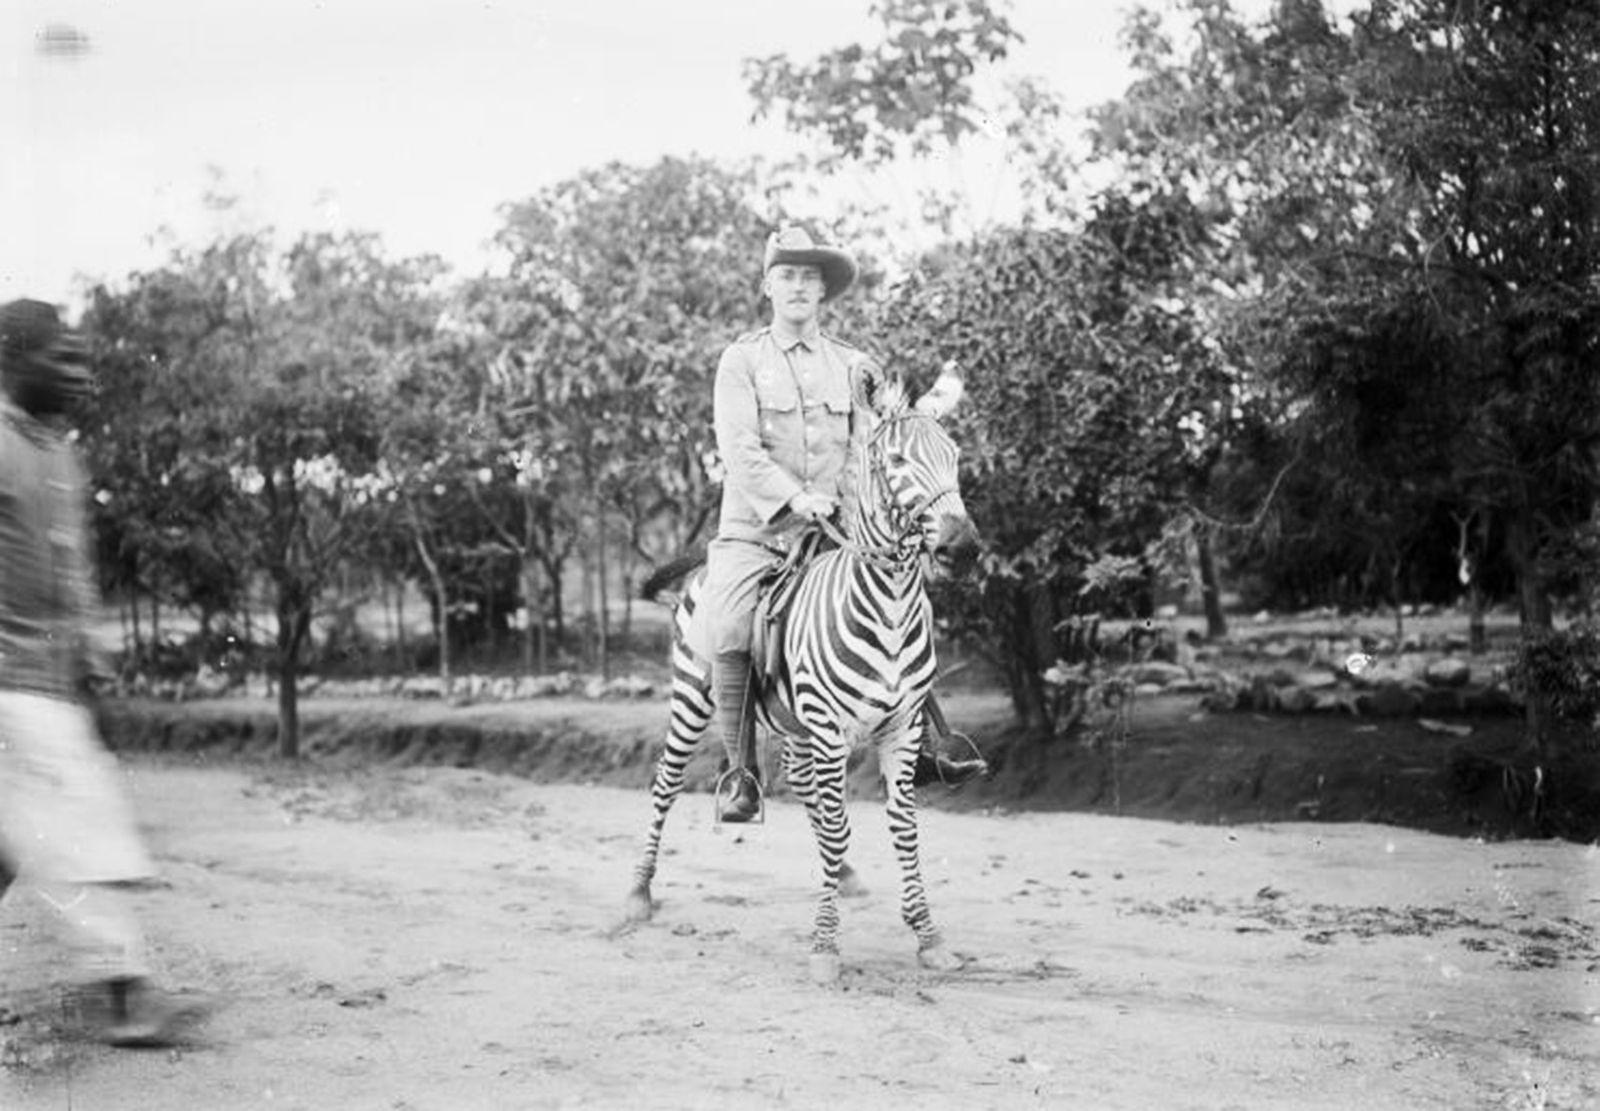 Zebra-Reiter